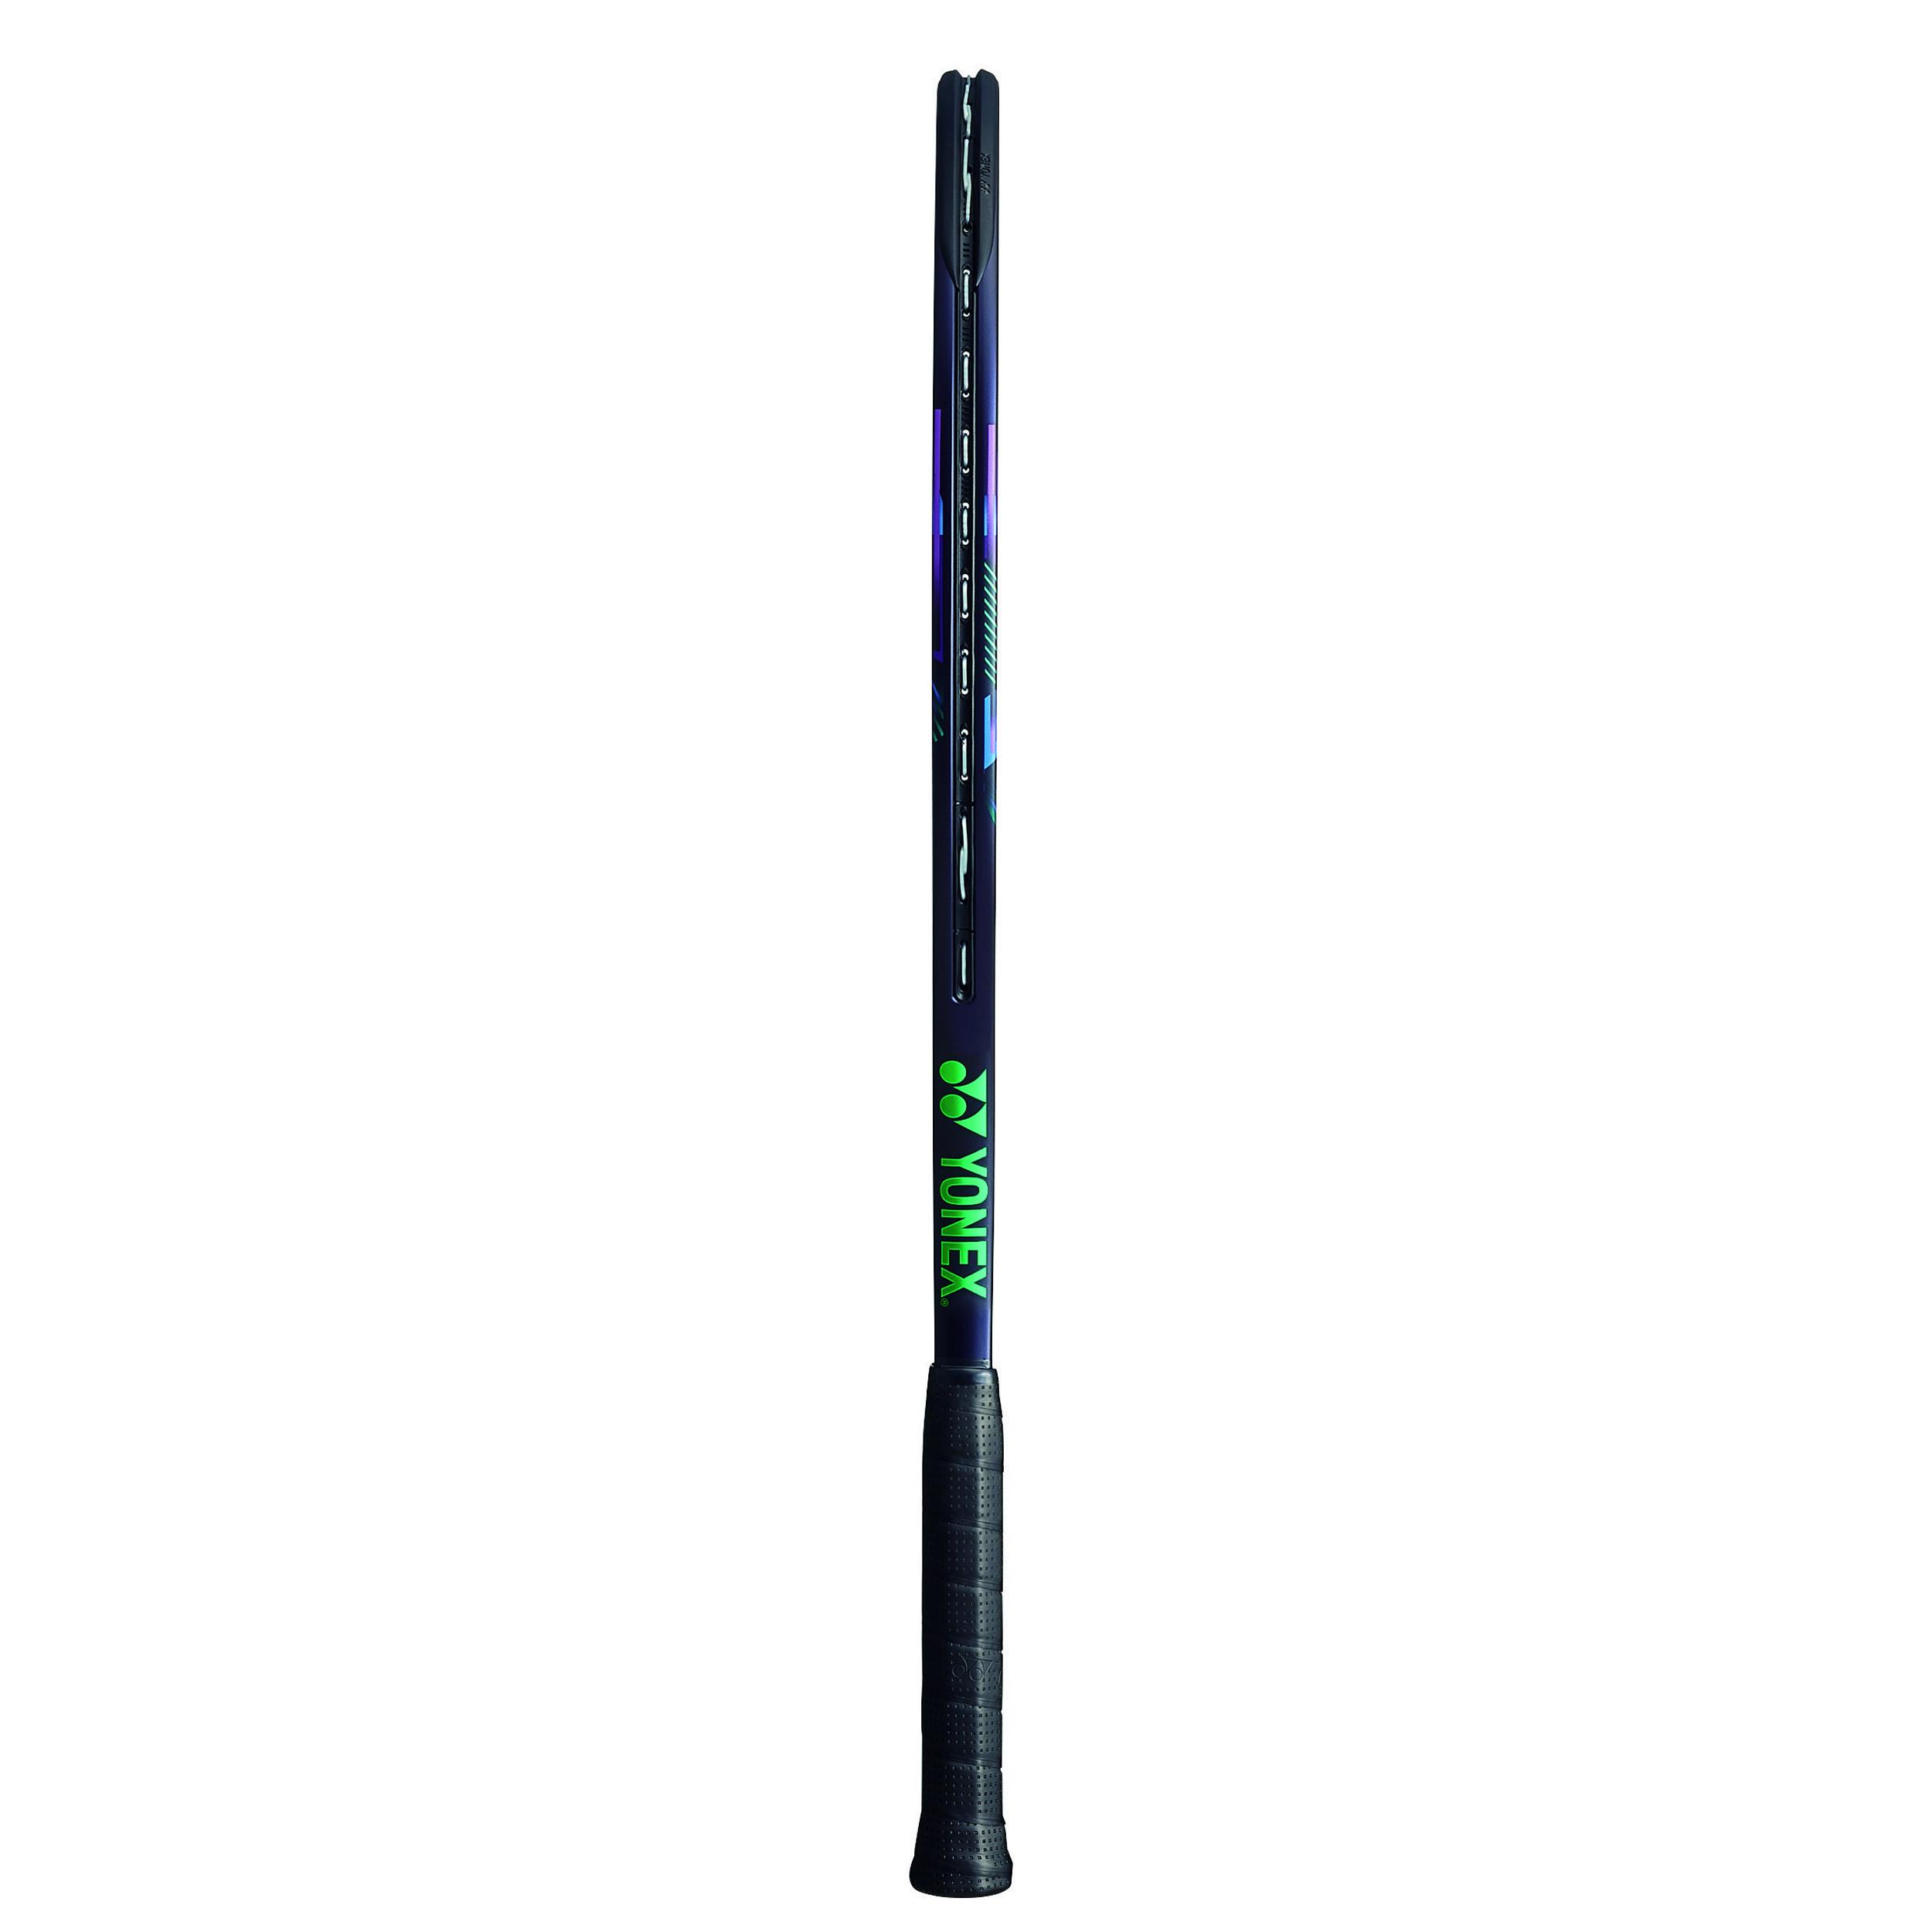 Yonex Vcore Pro 100 300g Tennis Racquet – 2021